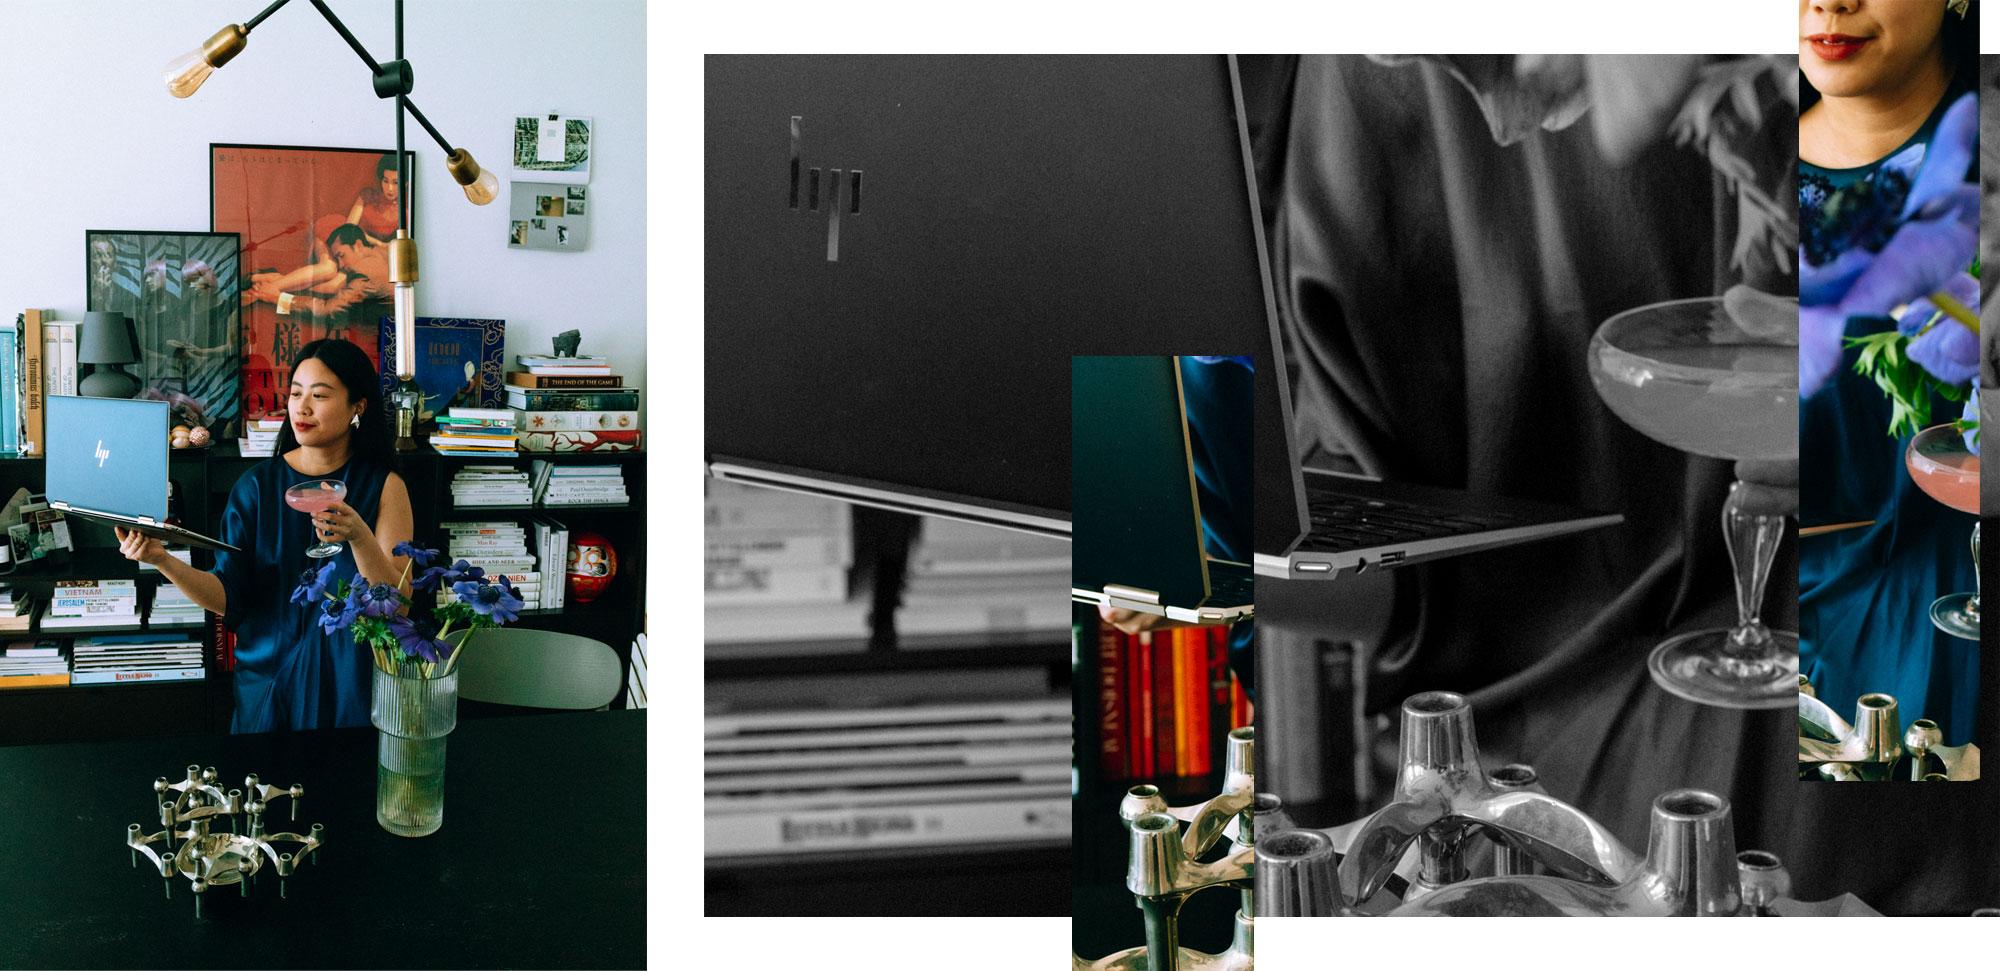 Home Office & Social Distancing – Meine Tipps für effektives Arbeiten & gegen Langeweile / iHeartAlice.com - Lifestyle, Fashion. Travel & Foodblog by Alice M. Huynh / German Blog